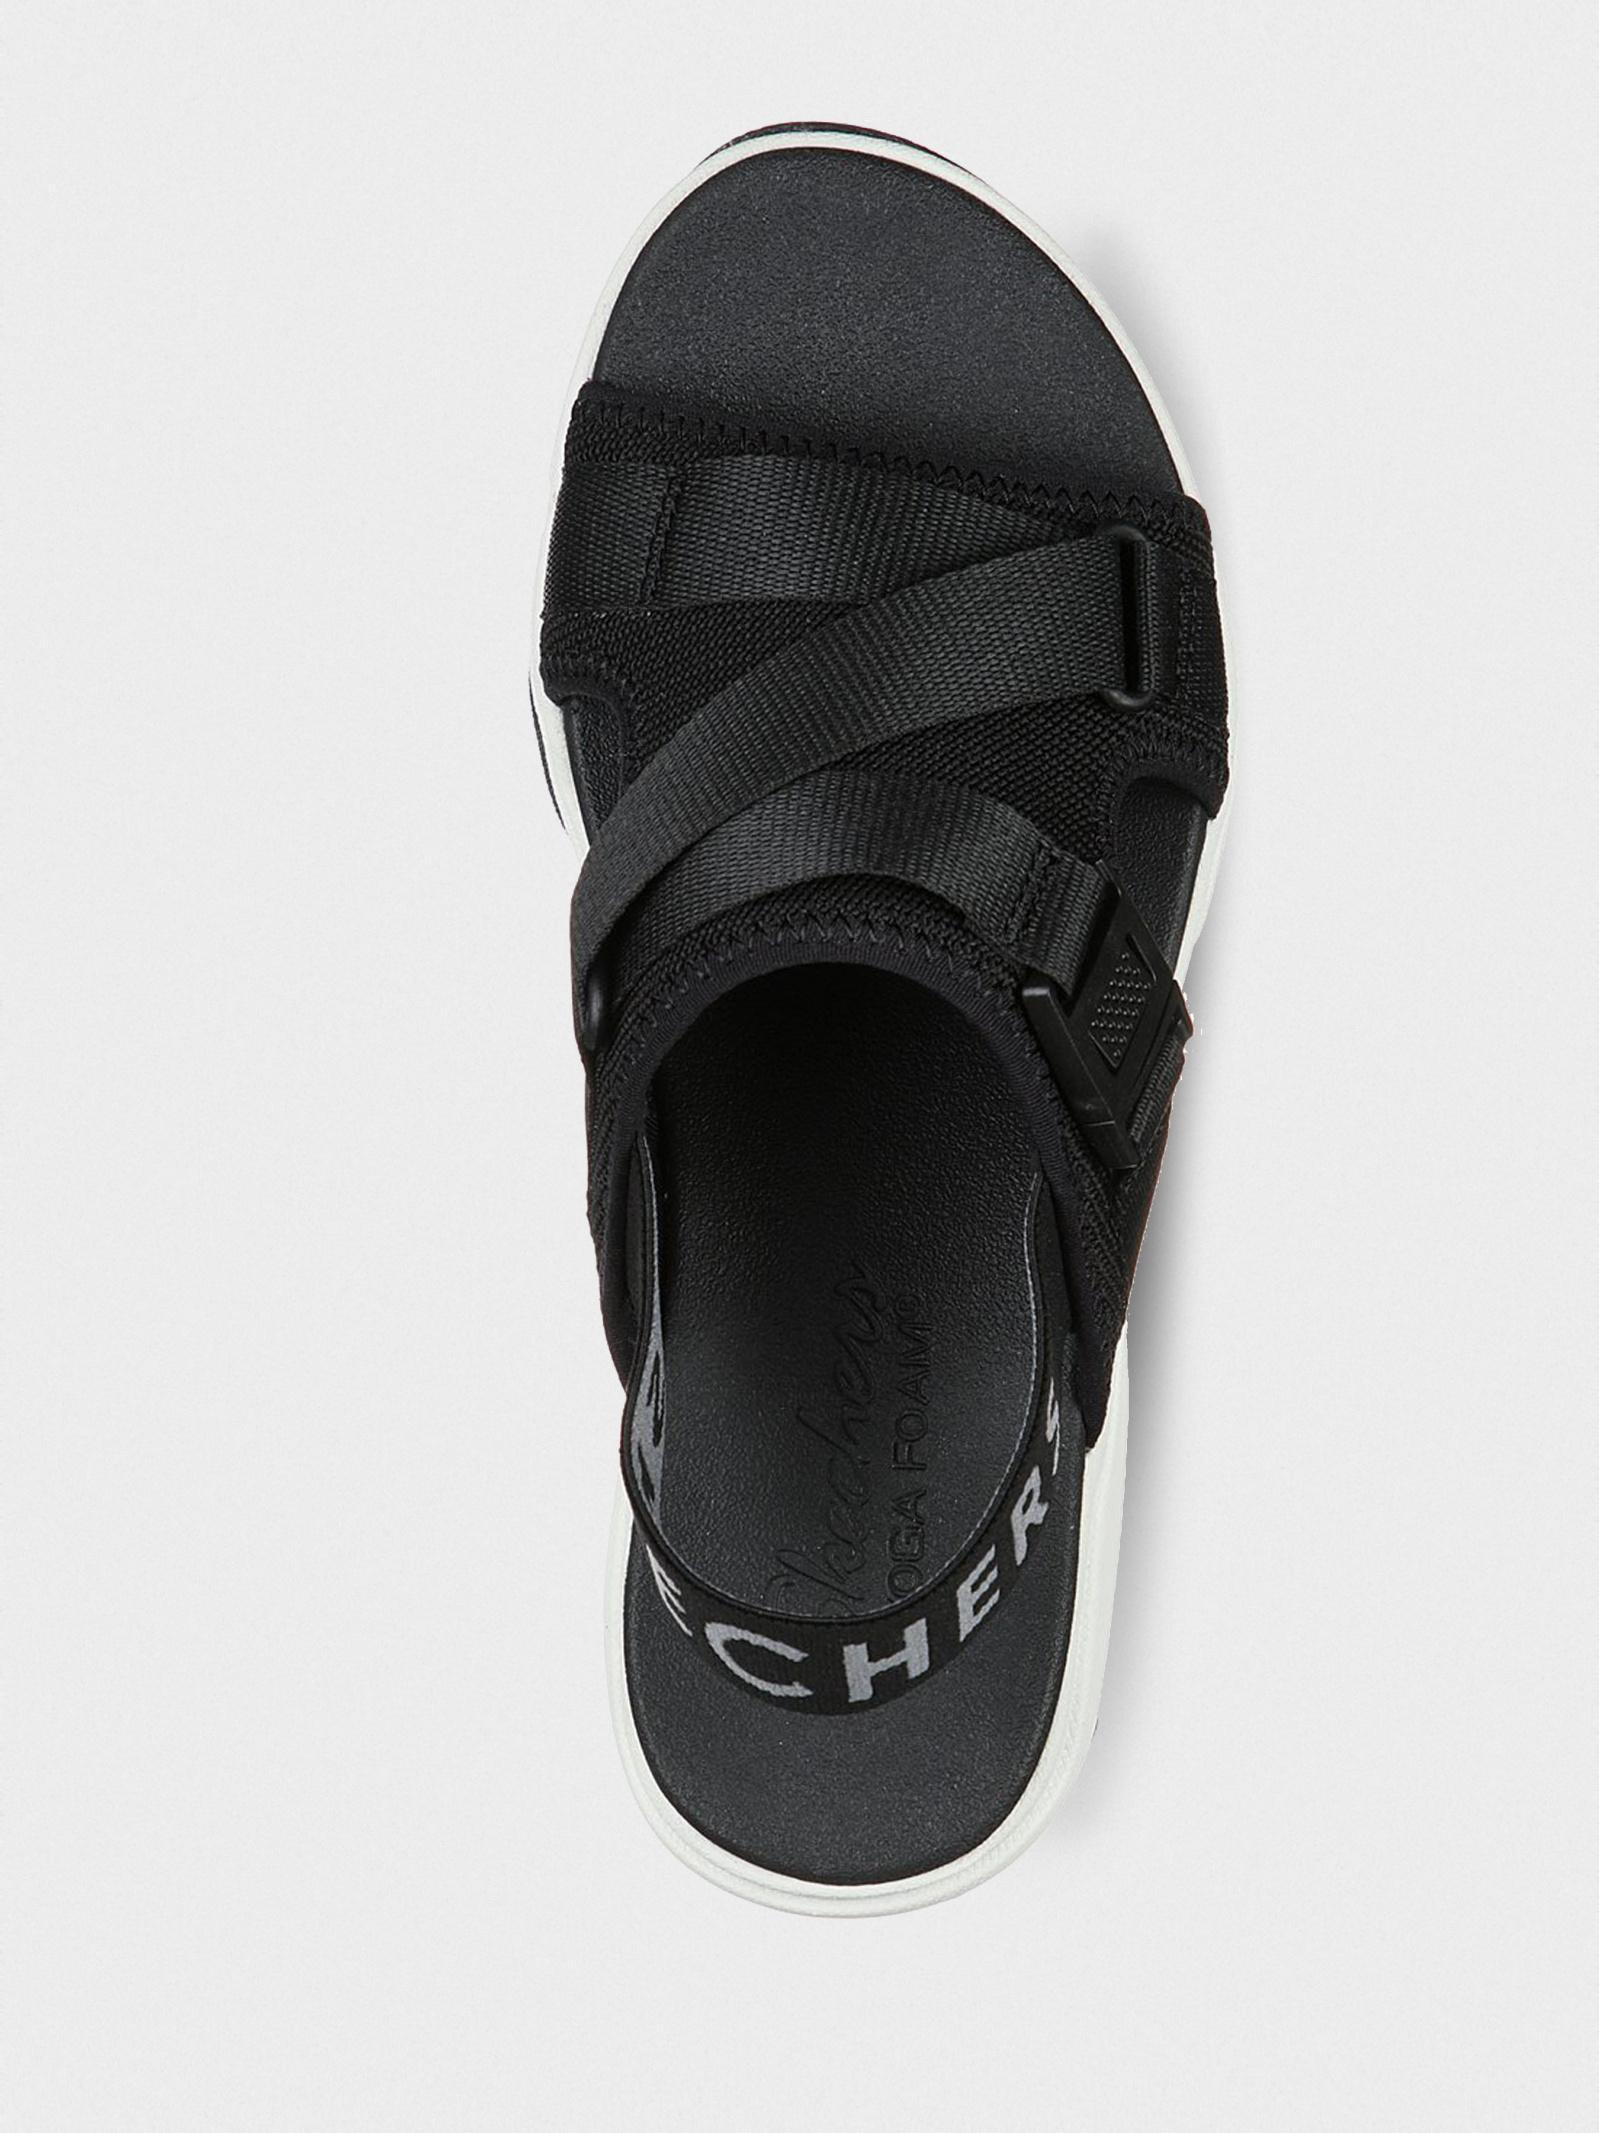 Сандалі  для жінок Skechers Modern Comfort 163051 BLK фото, купити, 2017